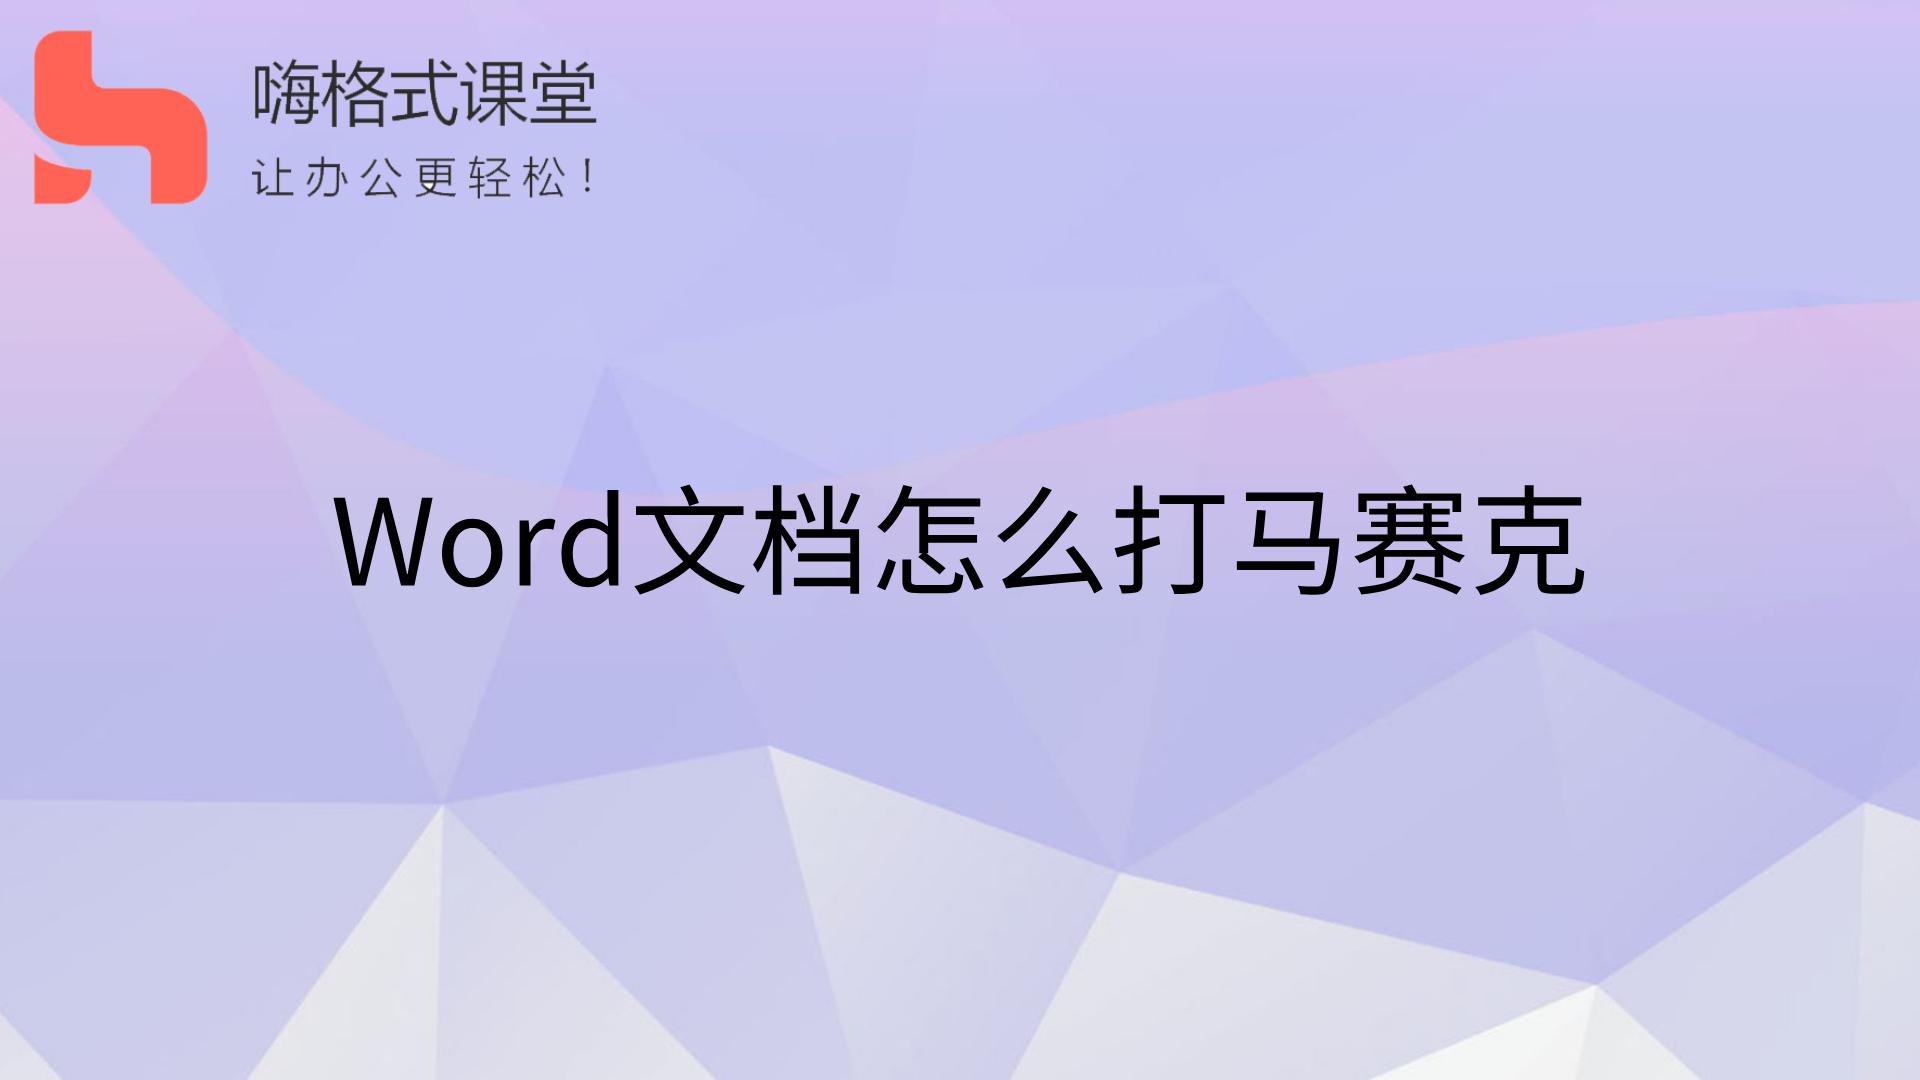 Word文档怎么打马赛克s